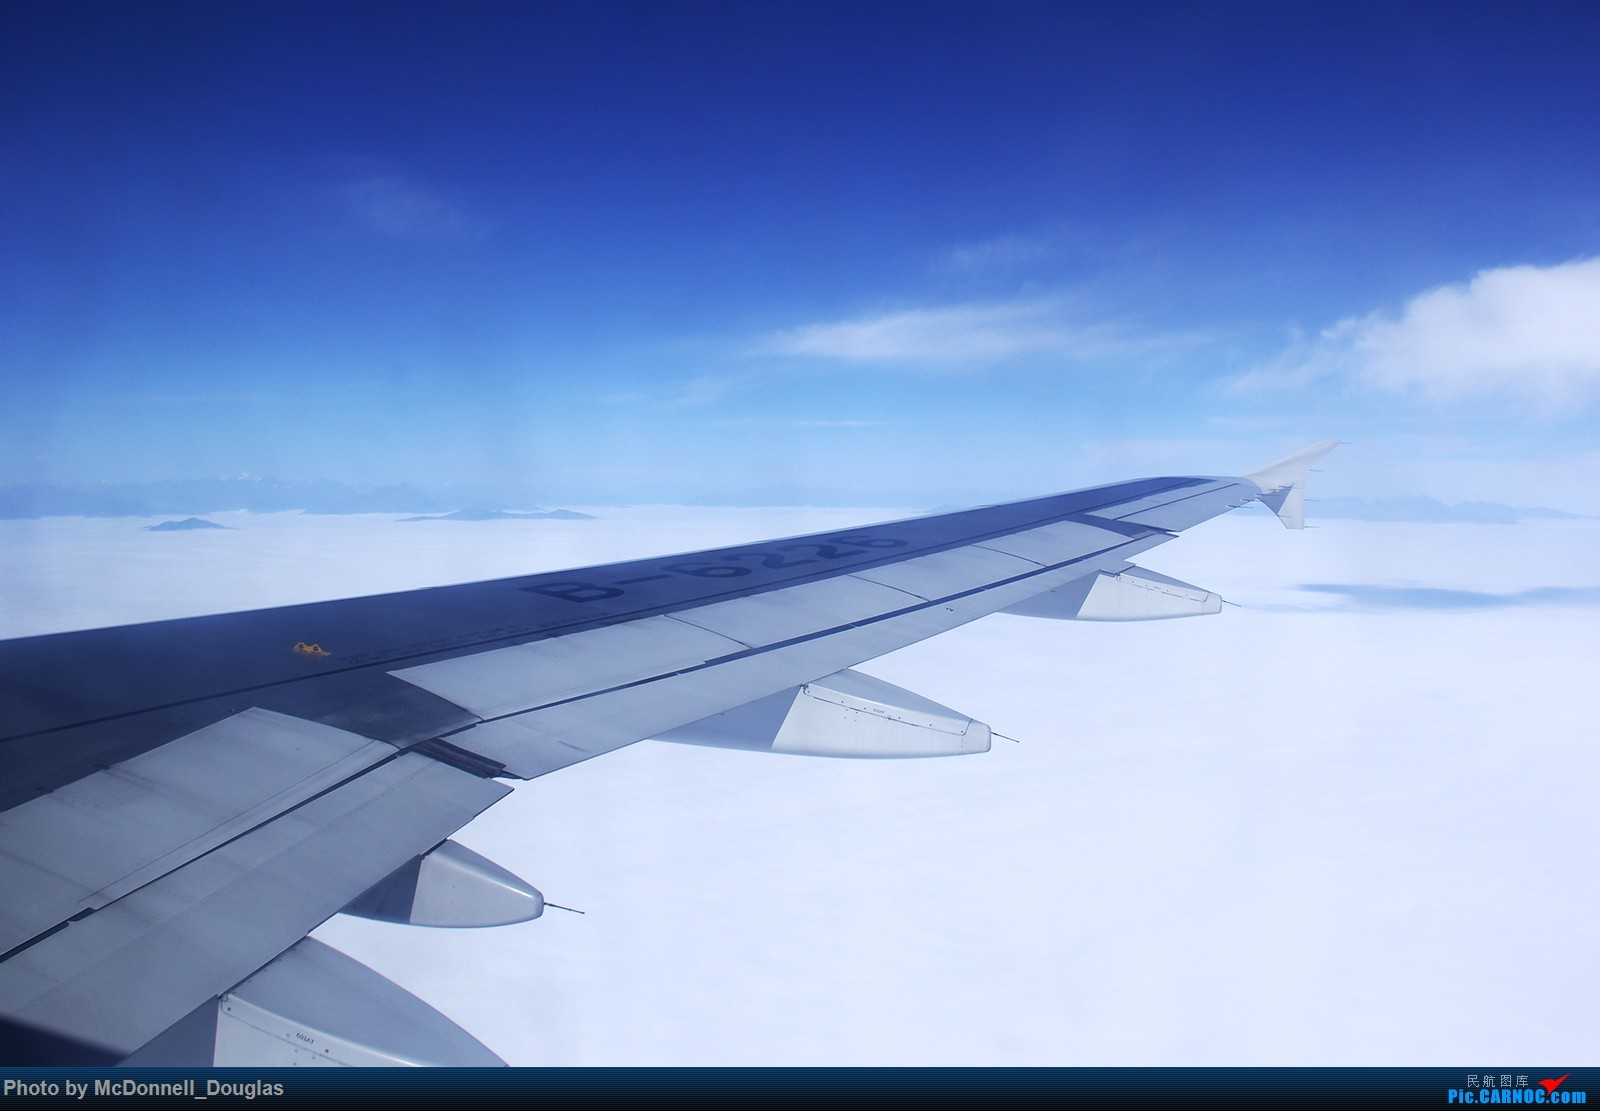 Re:[原创]【上海飞友会】【zc带你游天下(4)】不远千里飞跃喜马拉雅去看你,探寻高山另一边的神秘国度,和一群贫穷却快乐着的人们 AIRBUS A319-115 B-6226